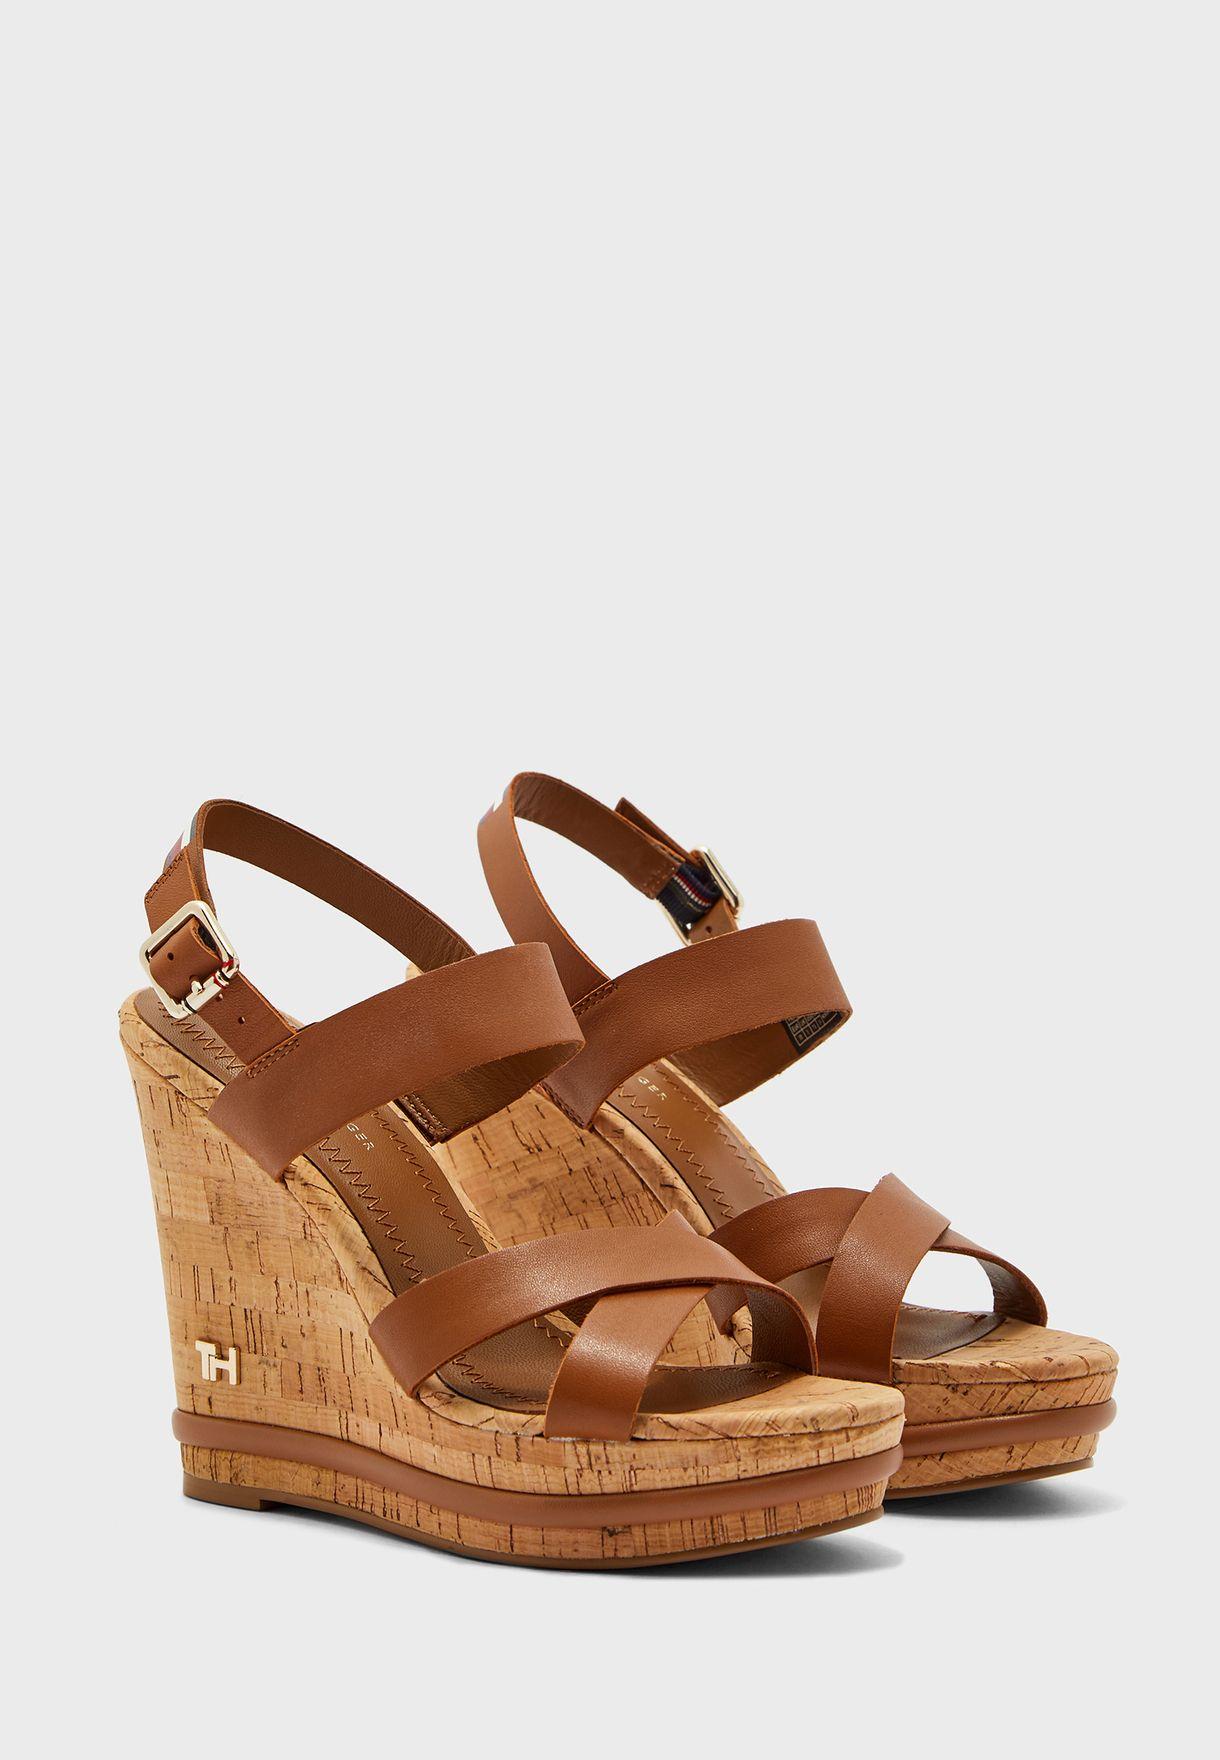 Corporate Leather  Wedge Sandal - GU9